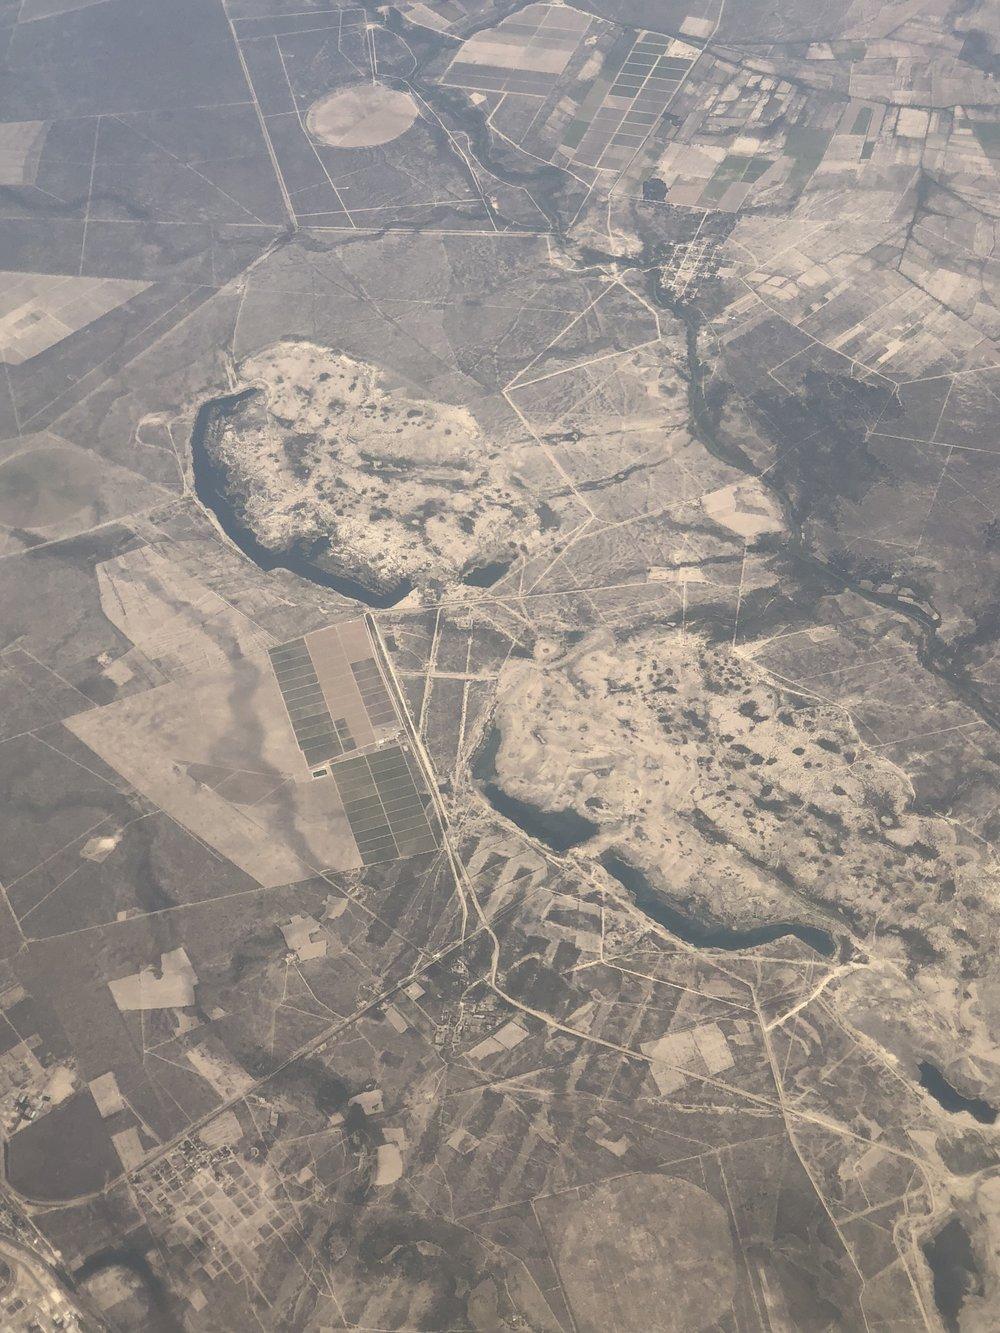 Inliers near Piedras Negras, Mexico.